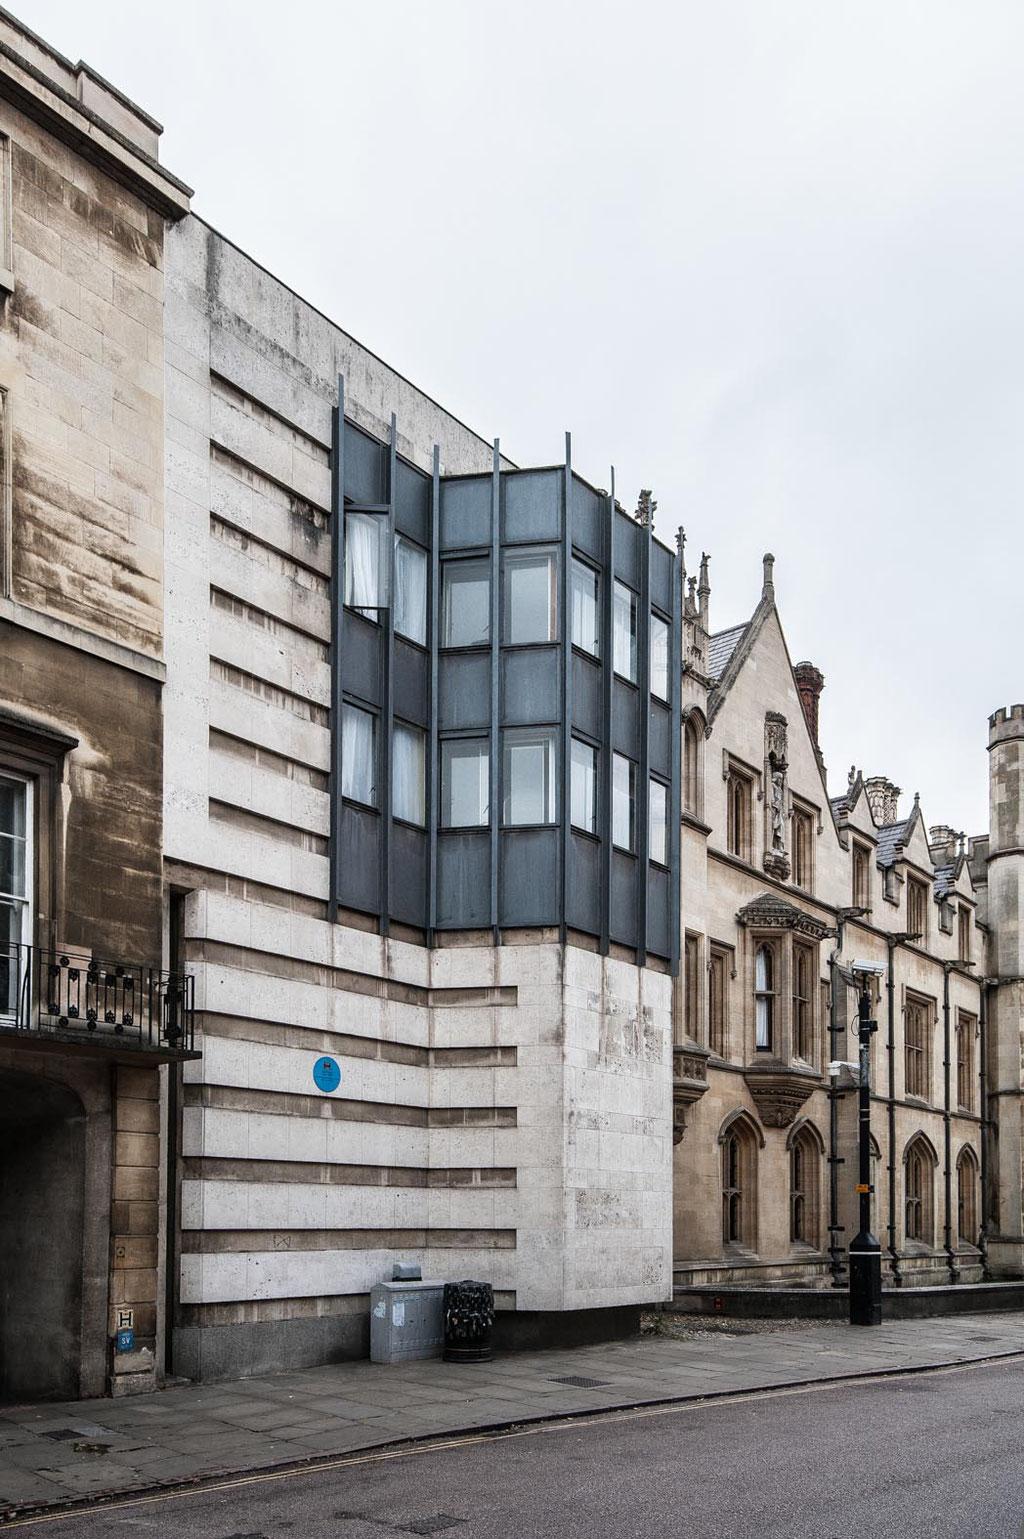 St.Catharine's College Library, Cambridge (UK)